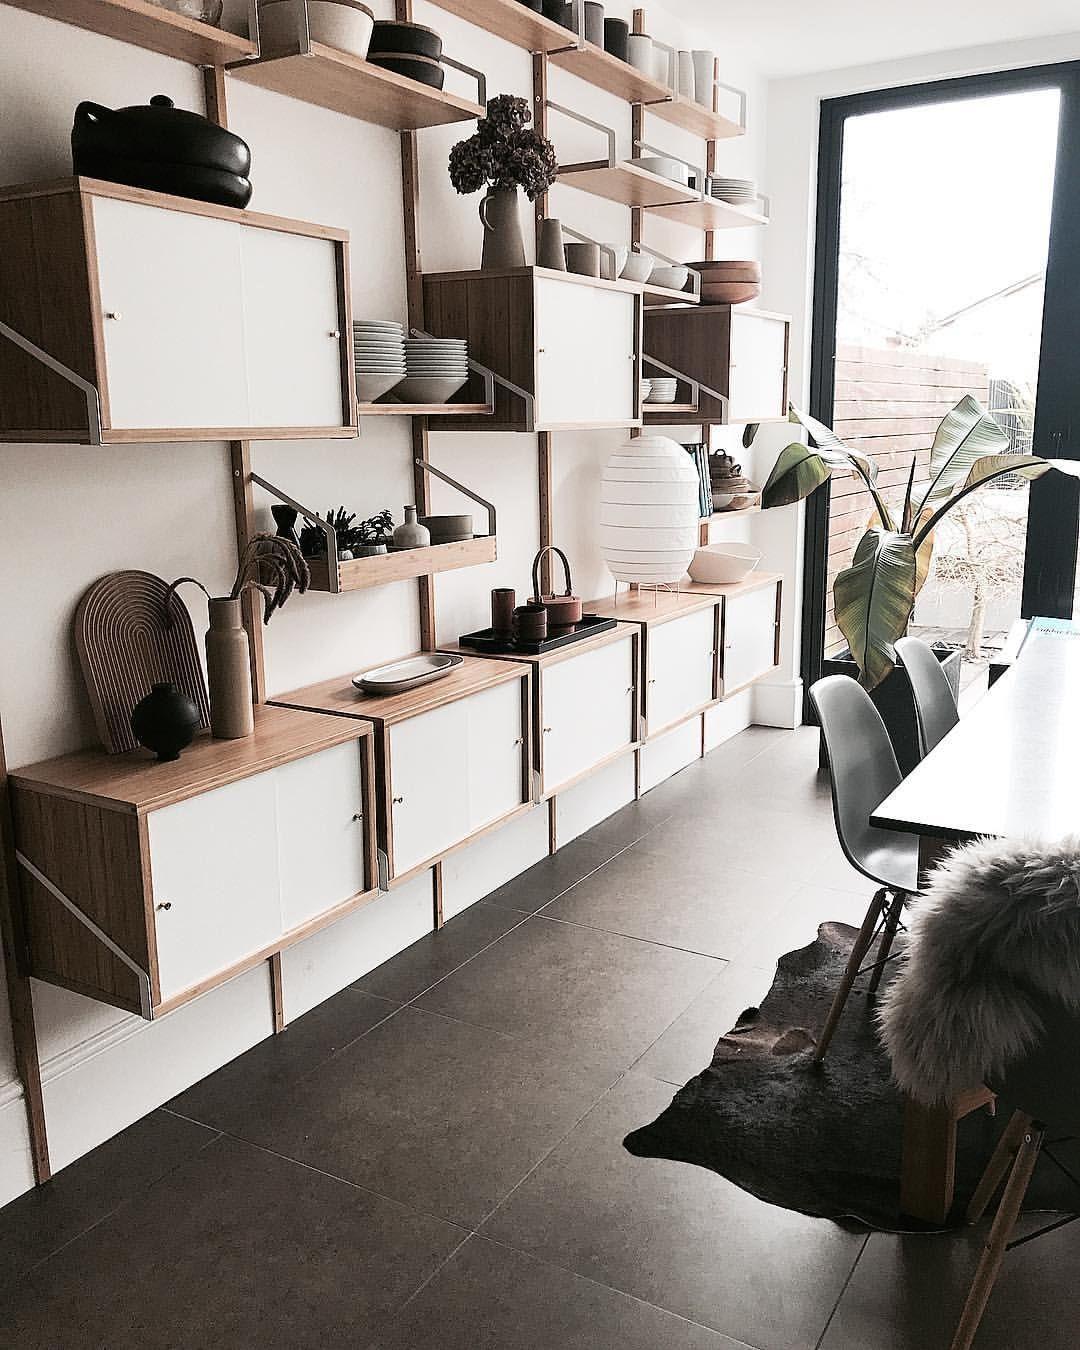 Ikea Svalnäs Wall Mounted Shelf Combination Svalnas In